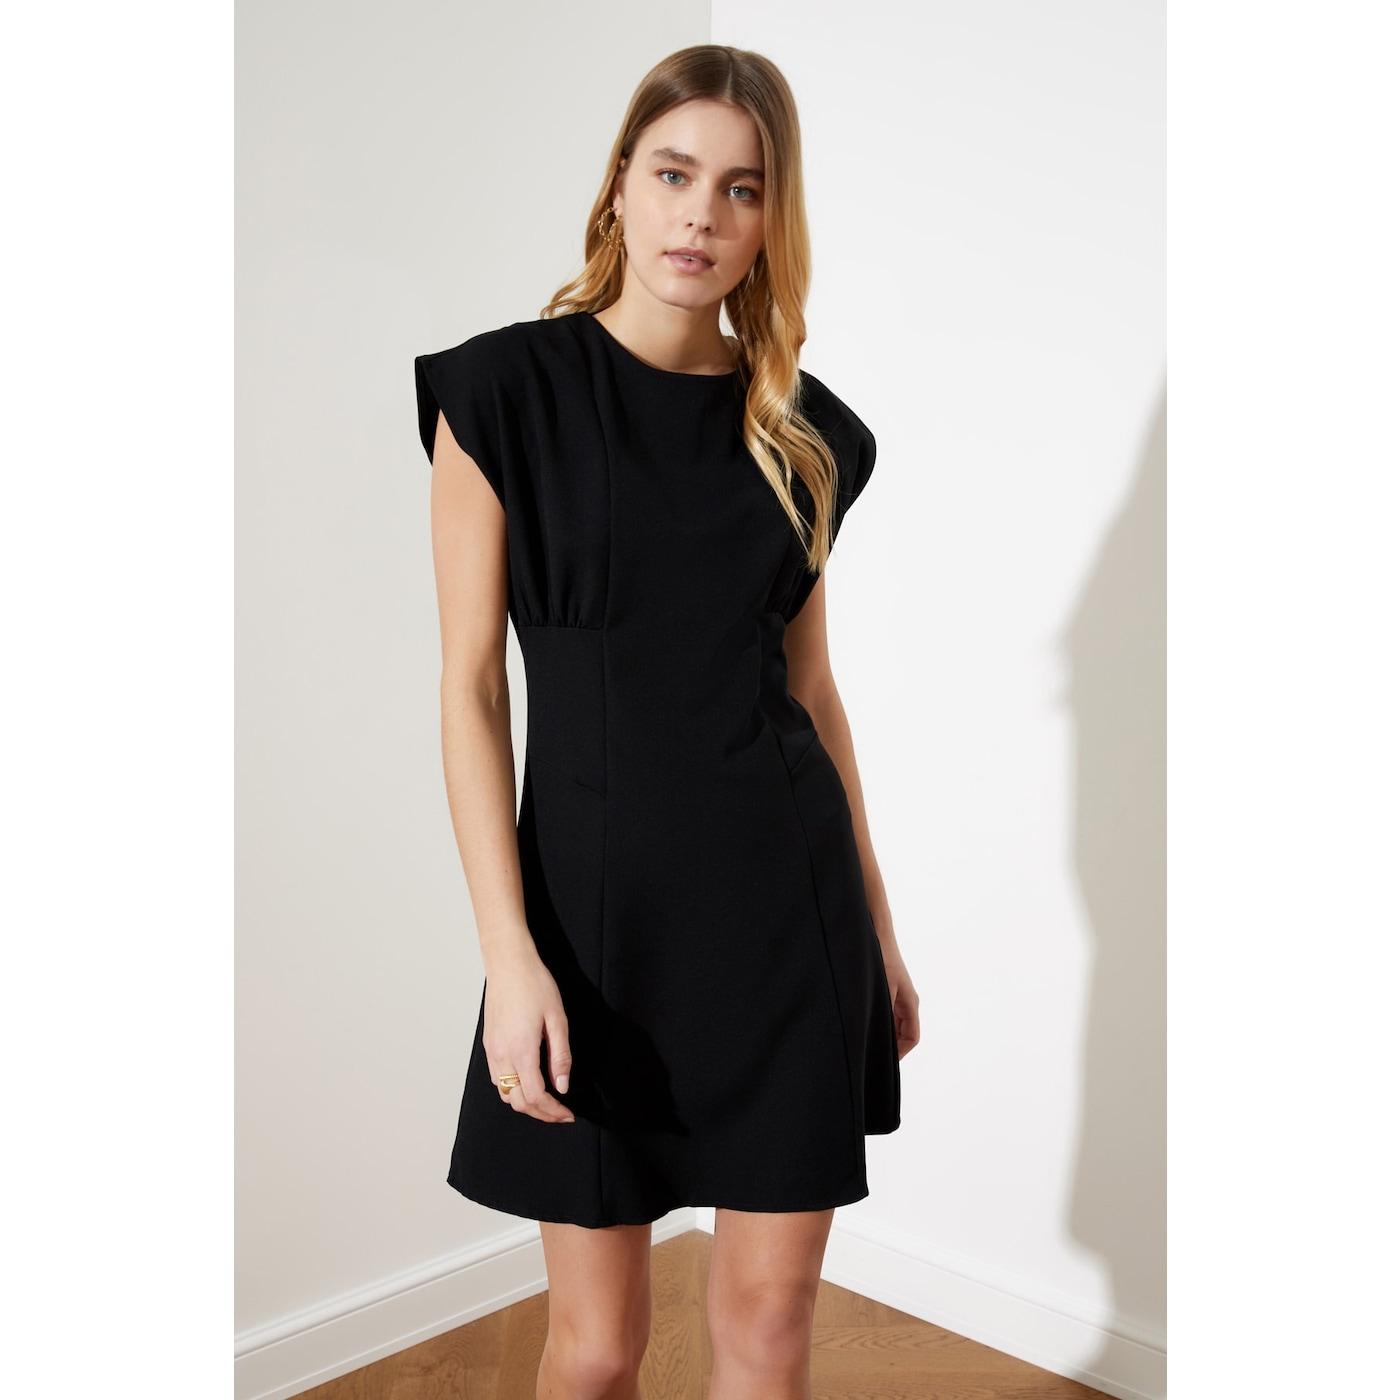 Trendyol Black Assk Detail Dress dámské 38